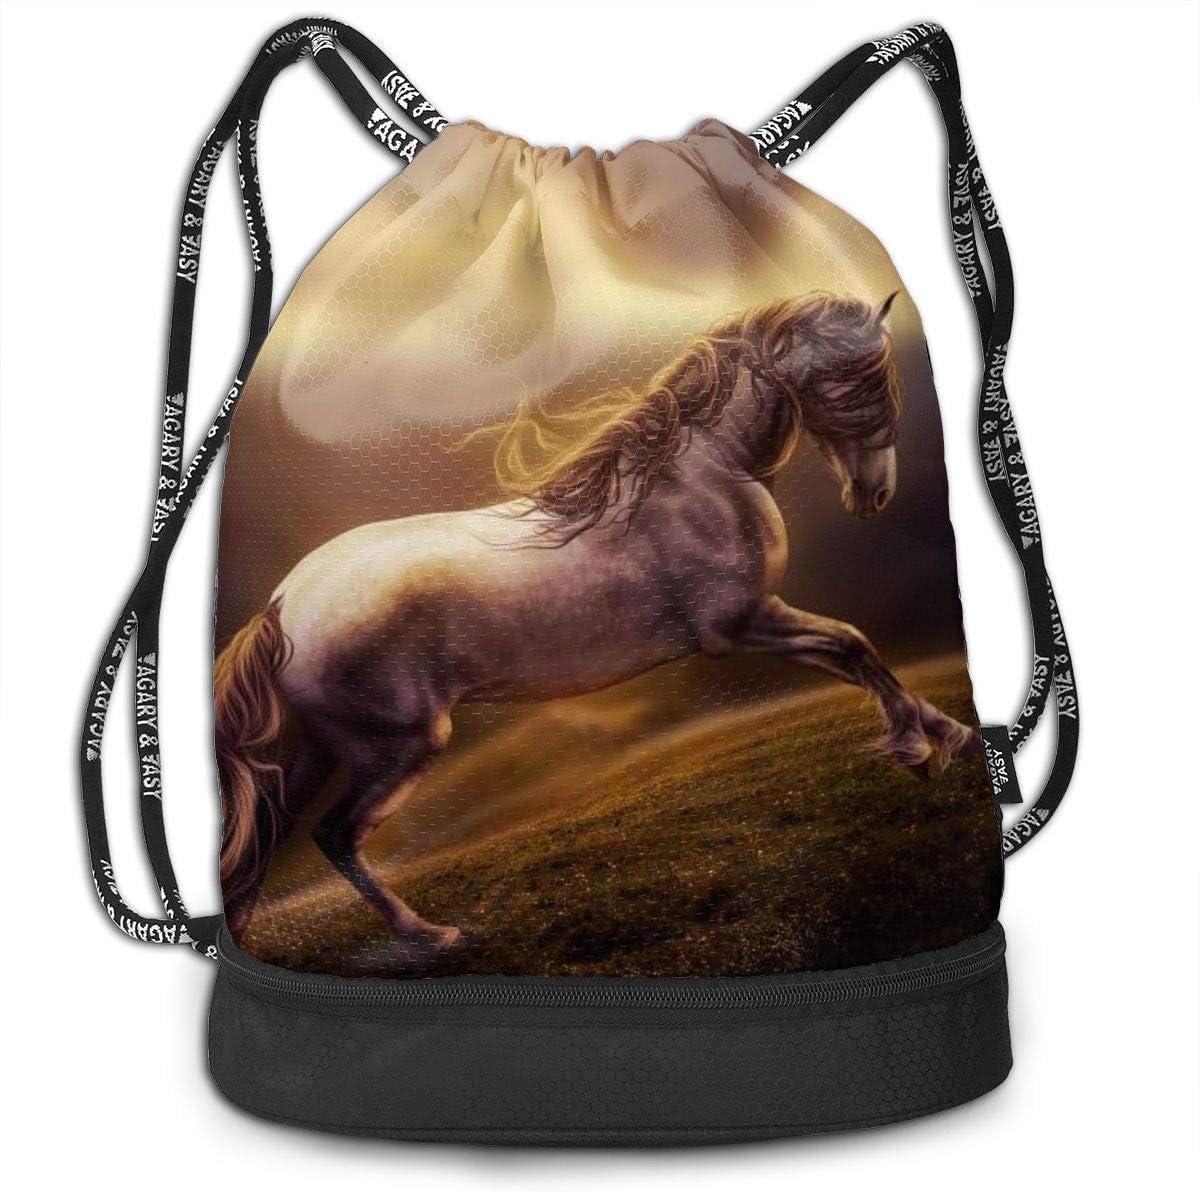 GymSack Drawstring Bag Sackpack Running Horse Sport Cinch Pack Simple Bundle Pocke Backpack For Men Women